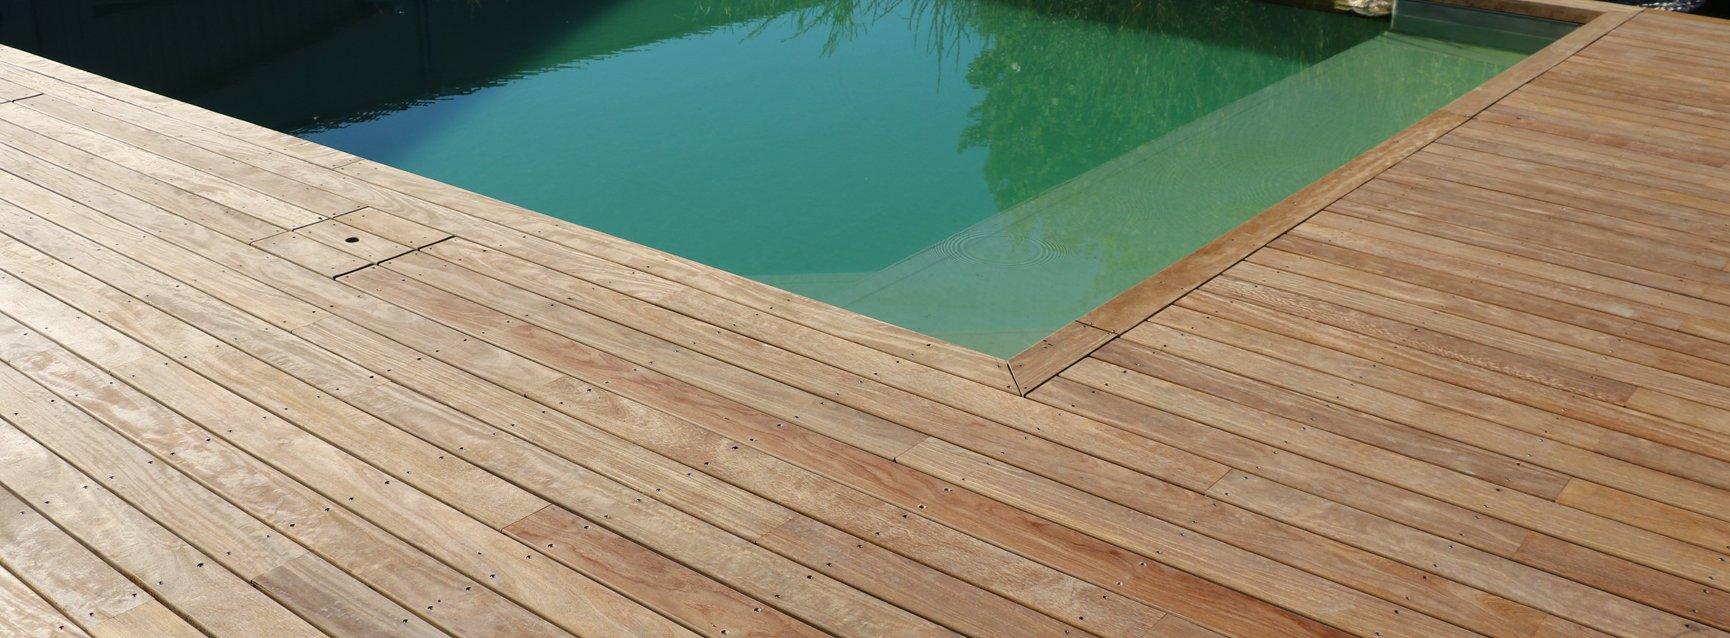 Terrasse bois Cumaru Sud Environnement